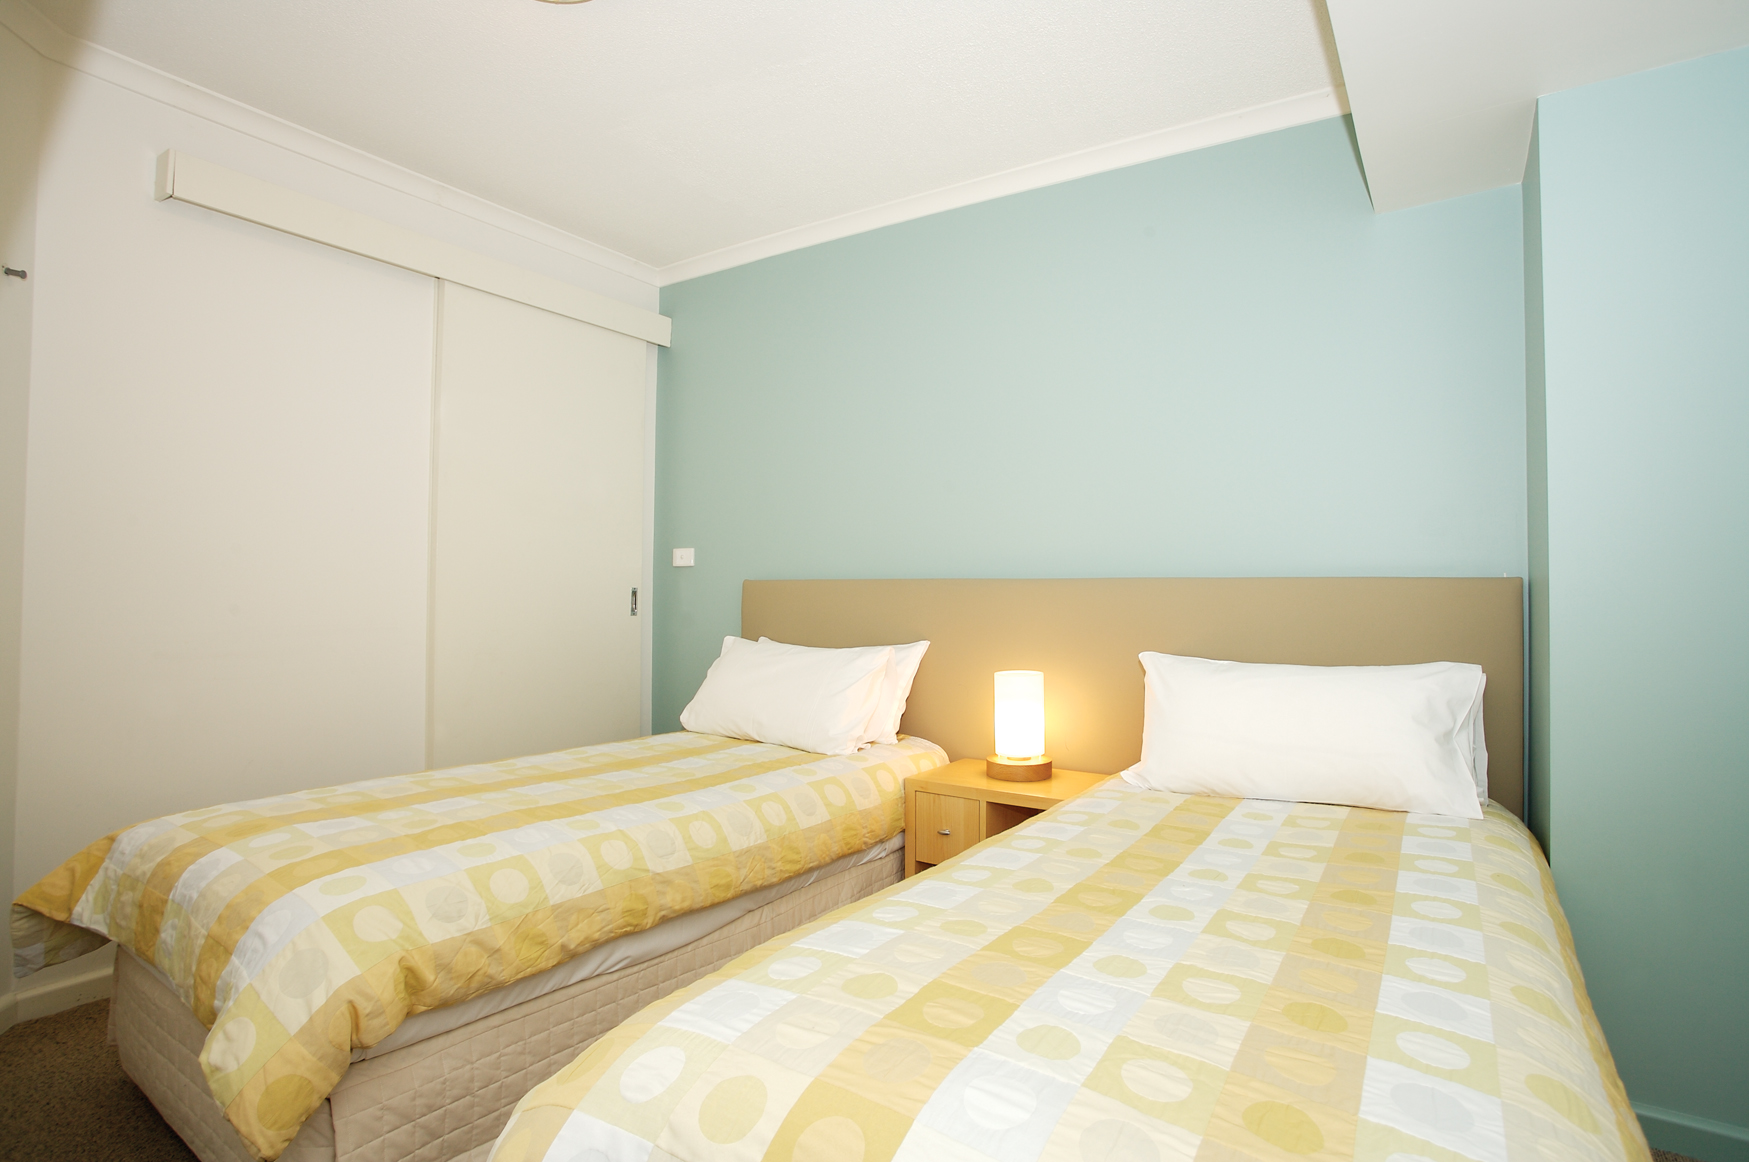 penthouse bedroom 2.jpg